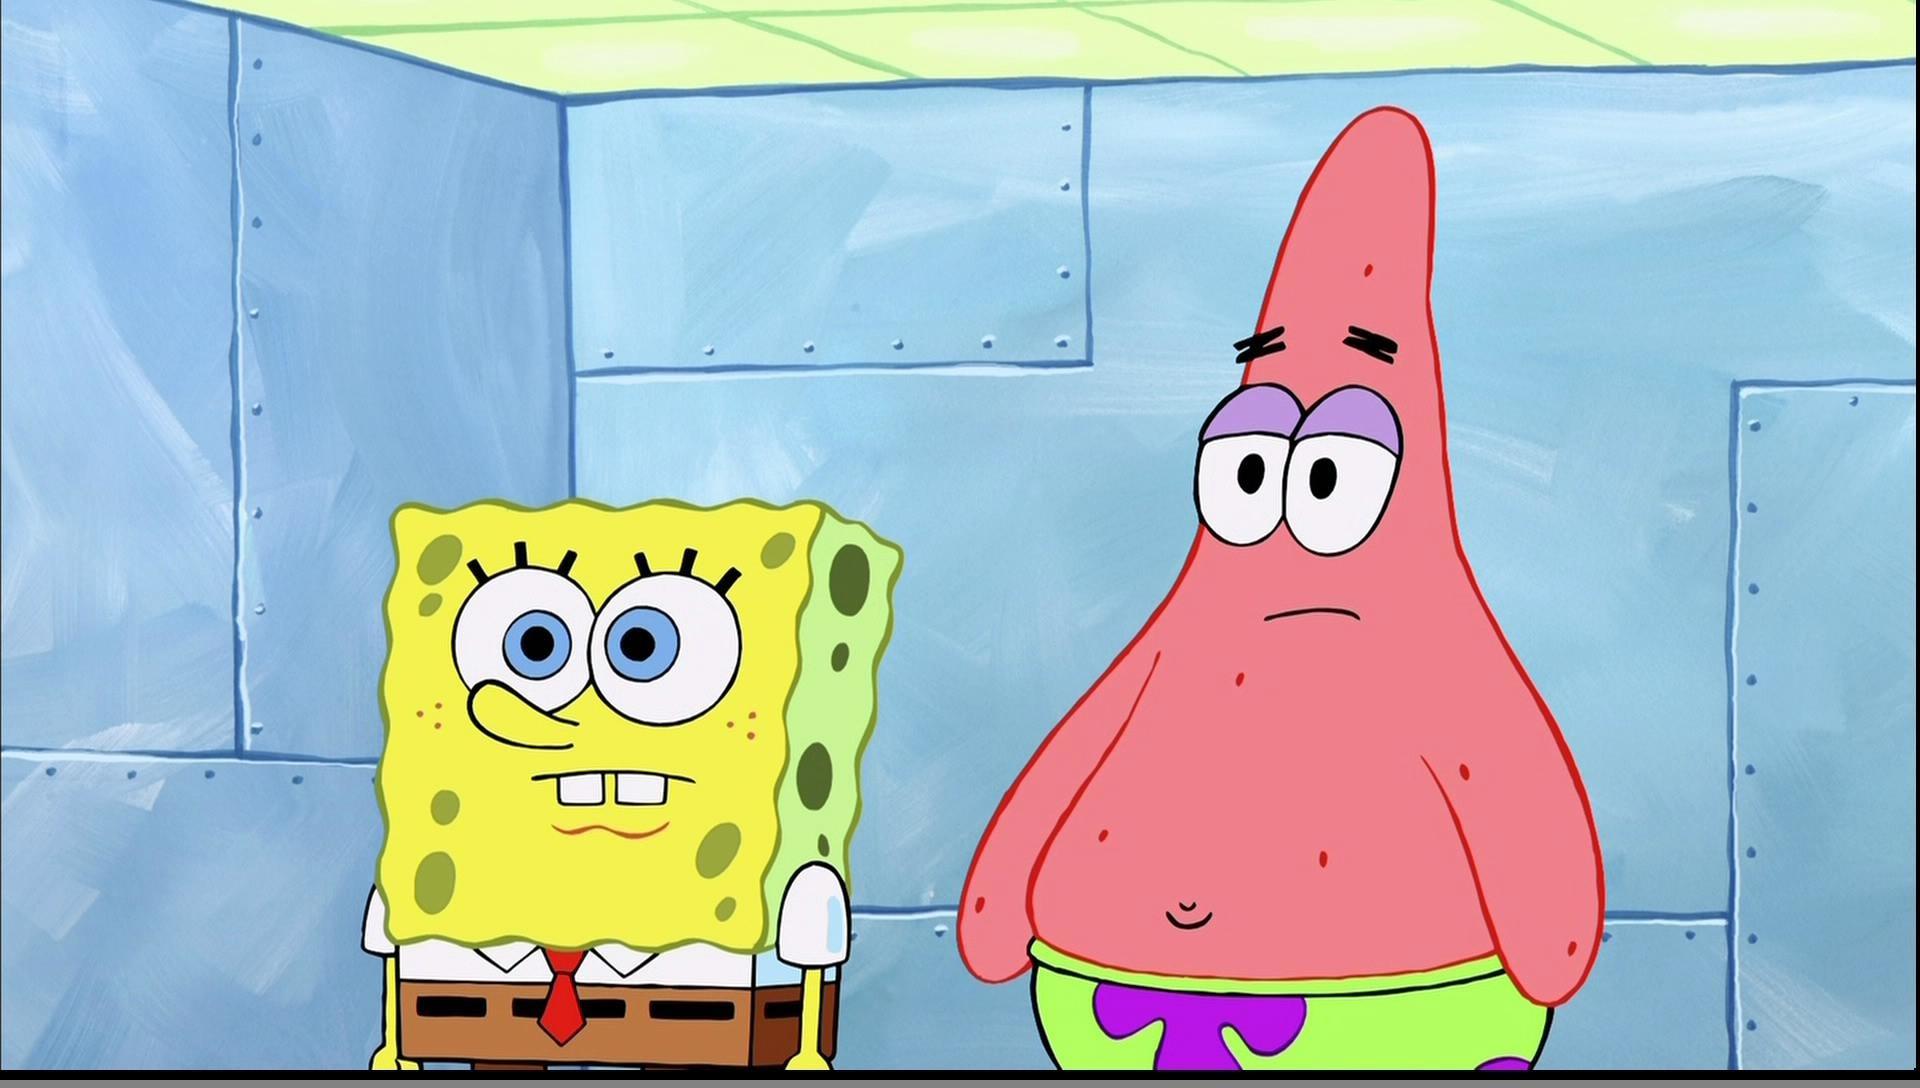 Patrick Spongebob SpongeBob SquarePants